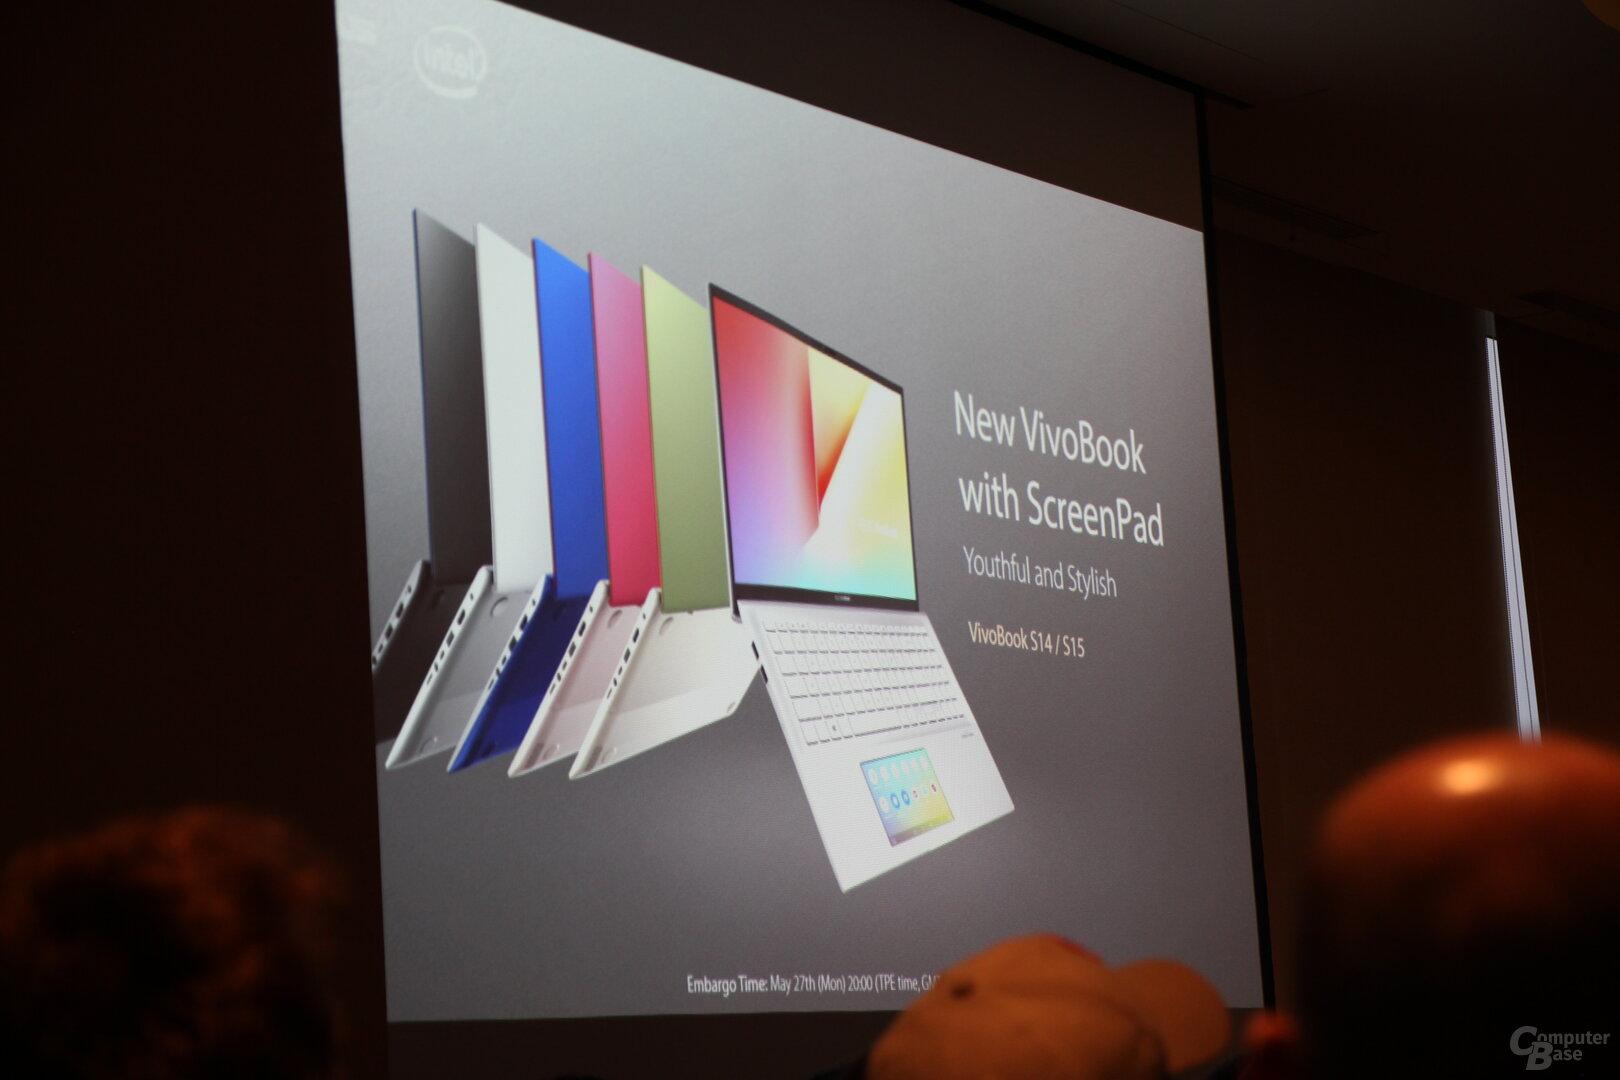 Das neue VivoBook mit ScreenPad